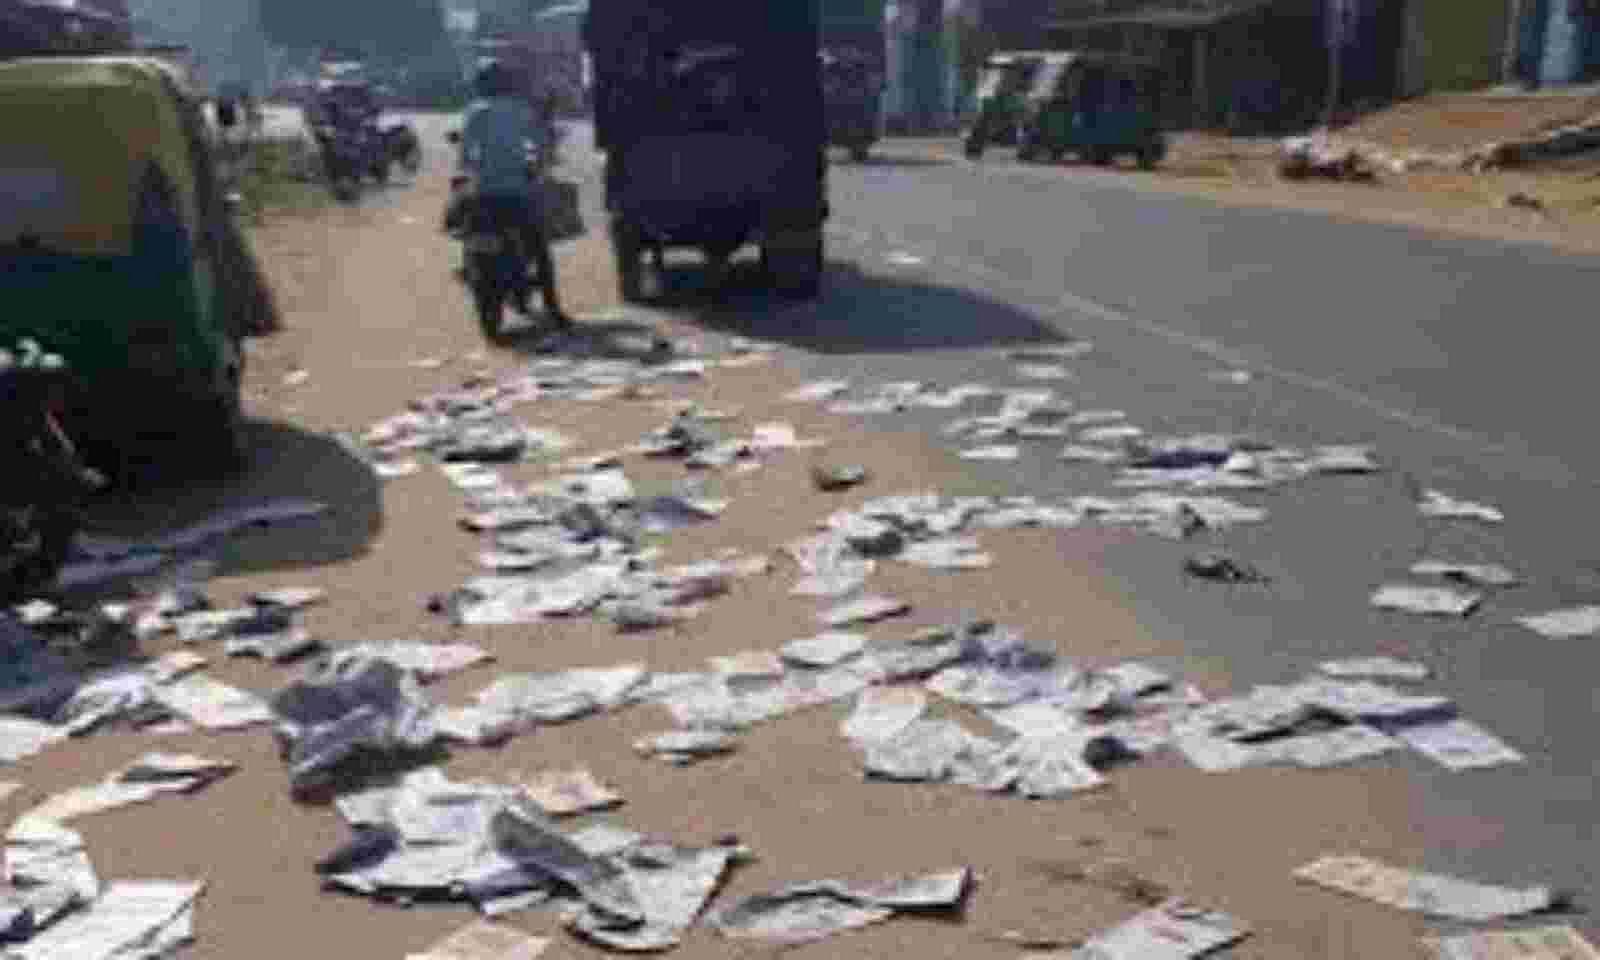 Did Exposure Of Rs 150 Crore Scam Lead To Protest Against Newspaper In Tripura Sentinelassam